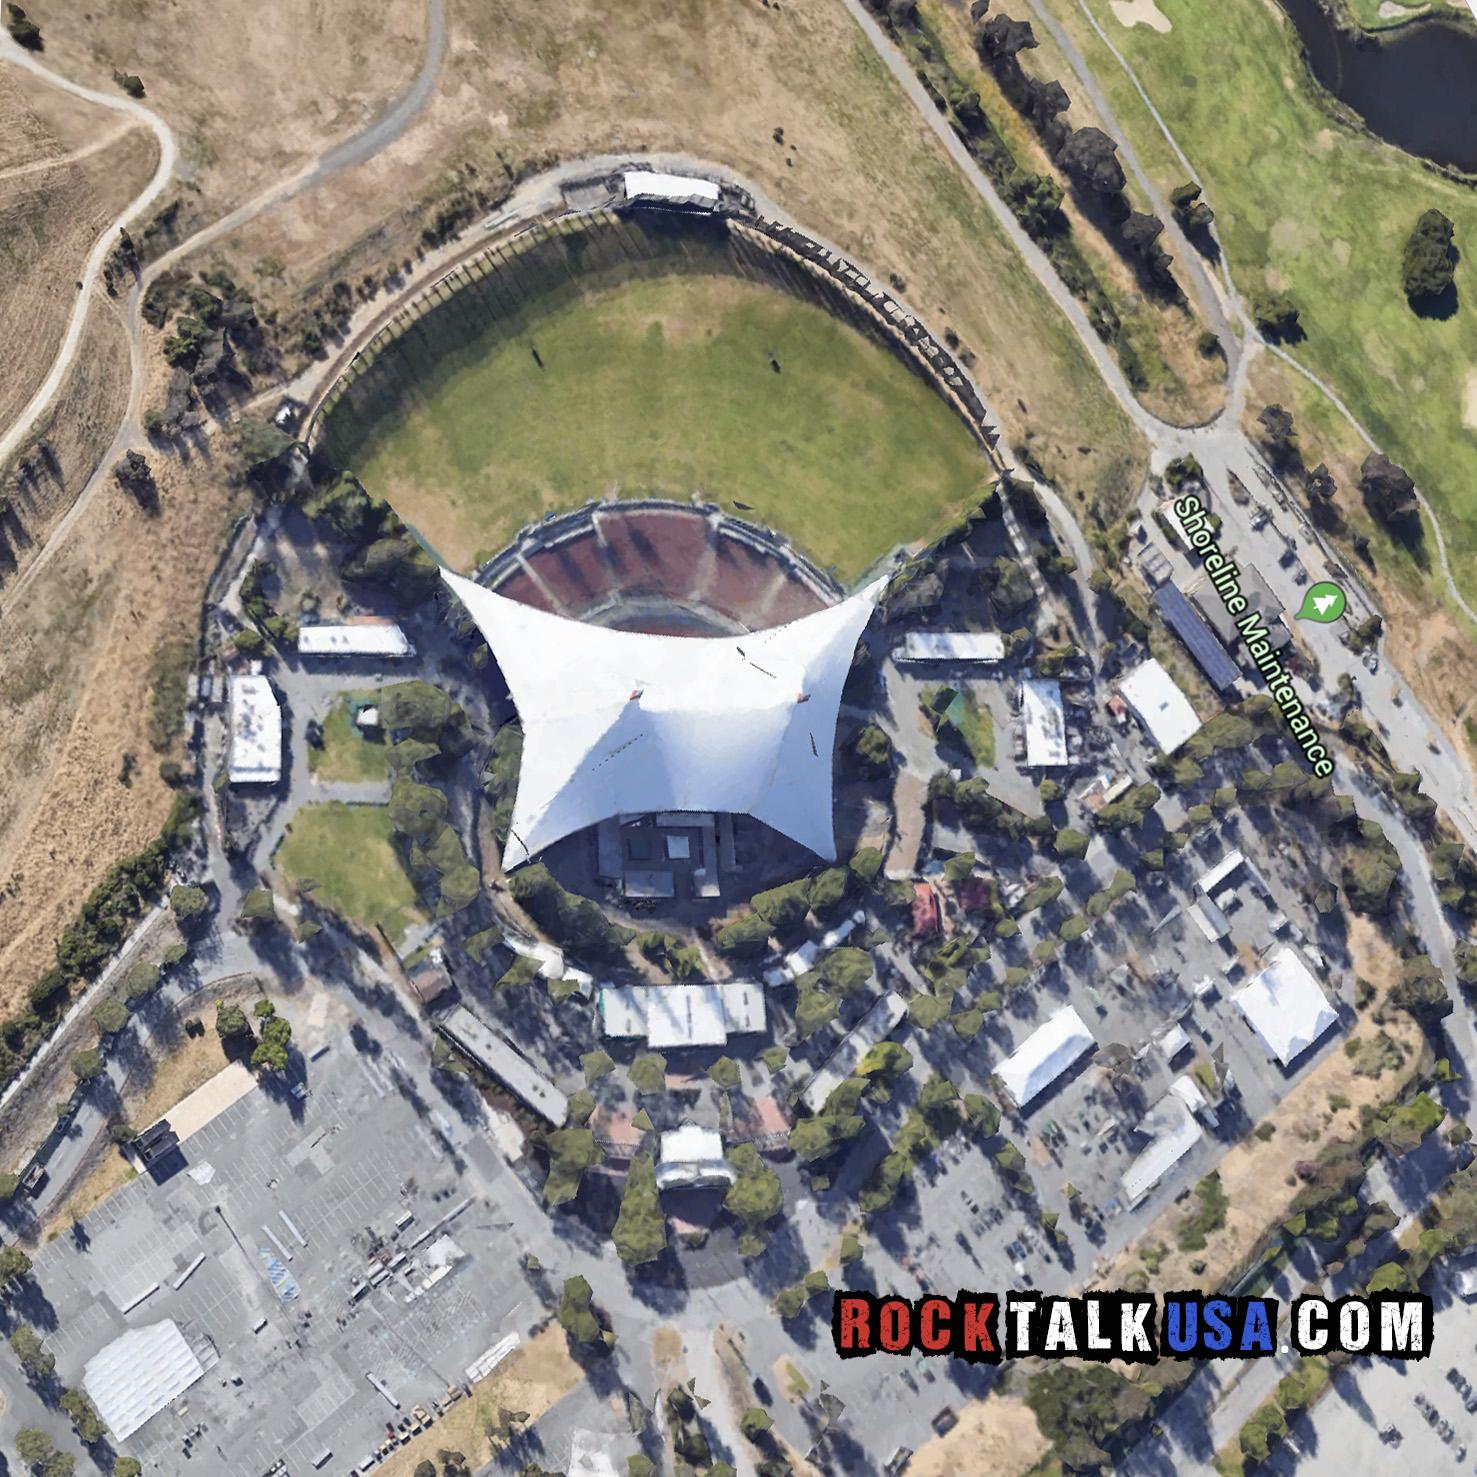 image shoreline amphitheater.jpg